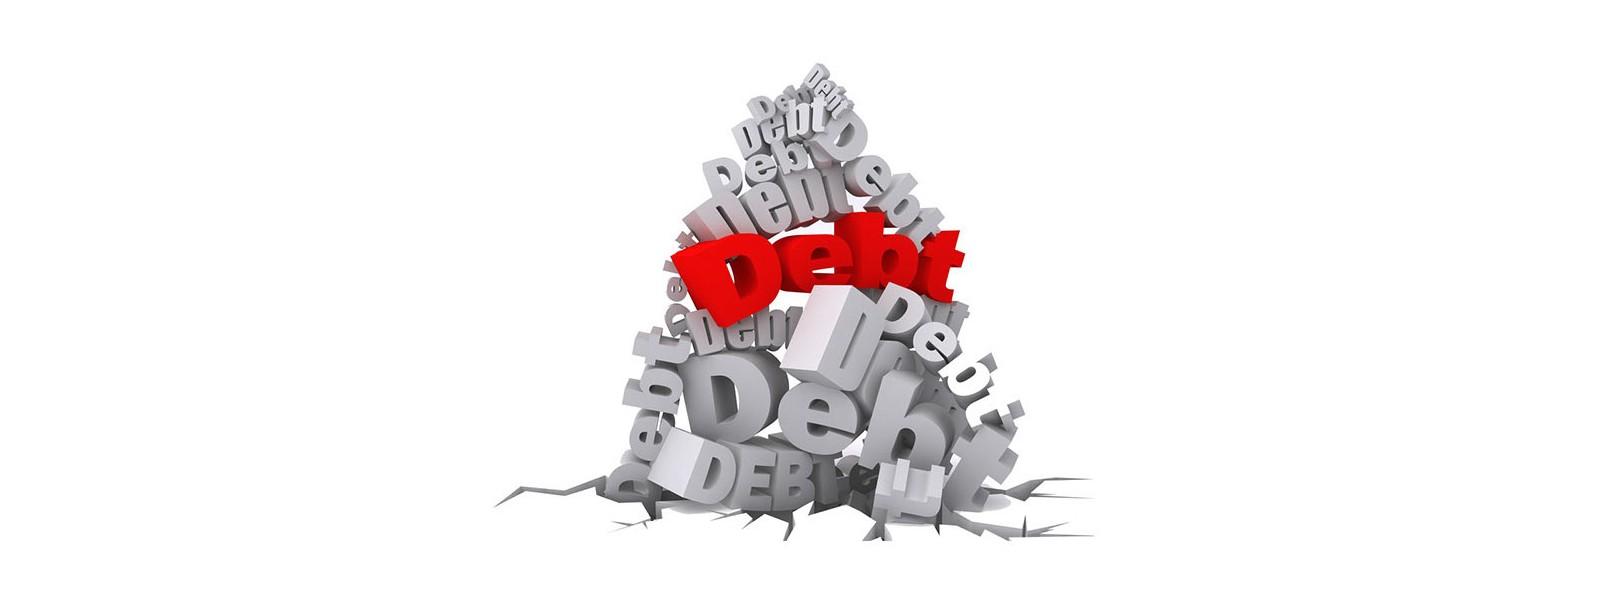 Sri Lanka's Debt burden up by Rs. 1.4 Trillion